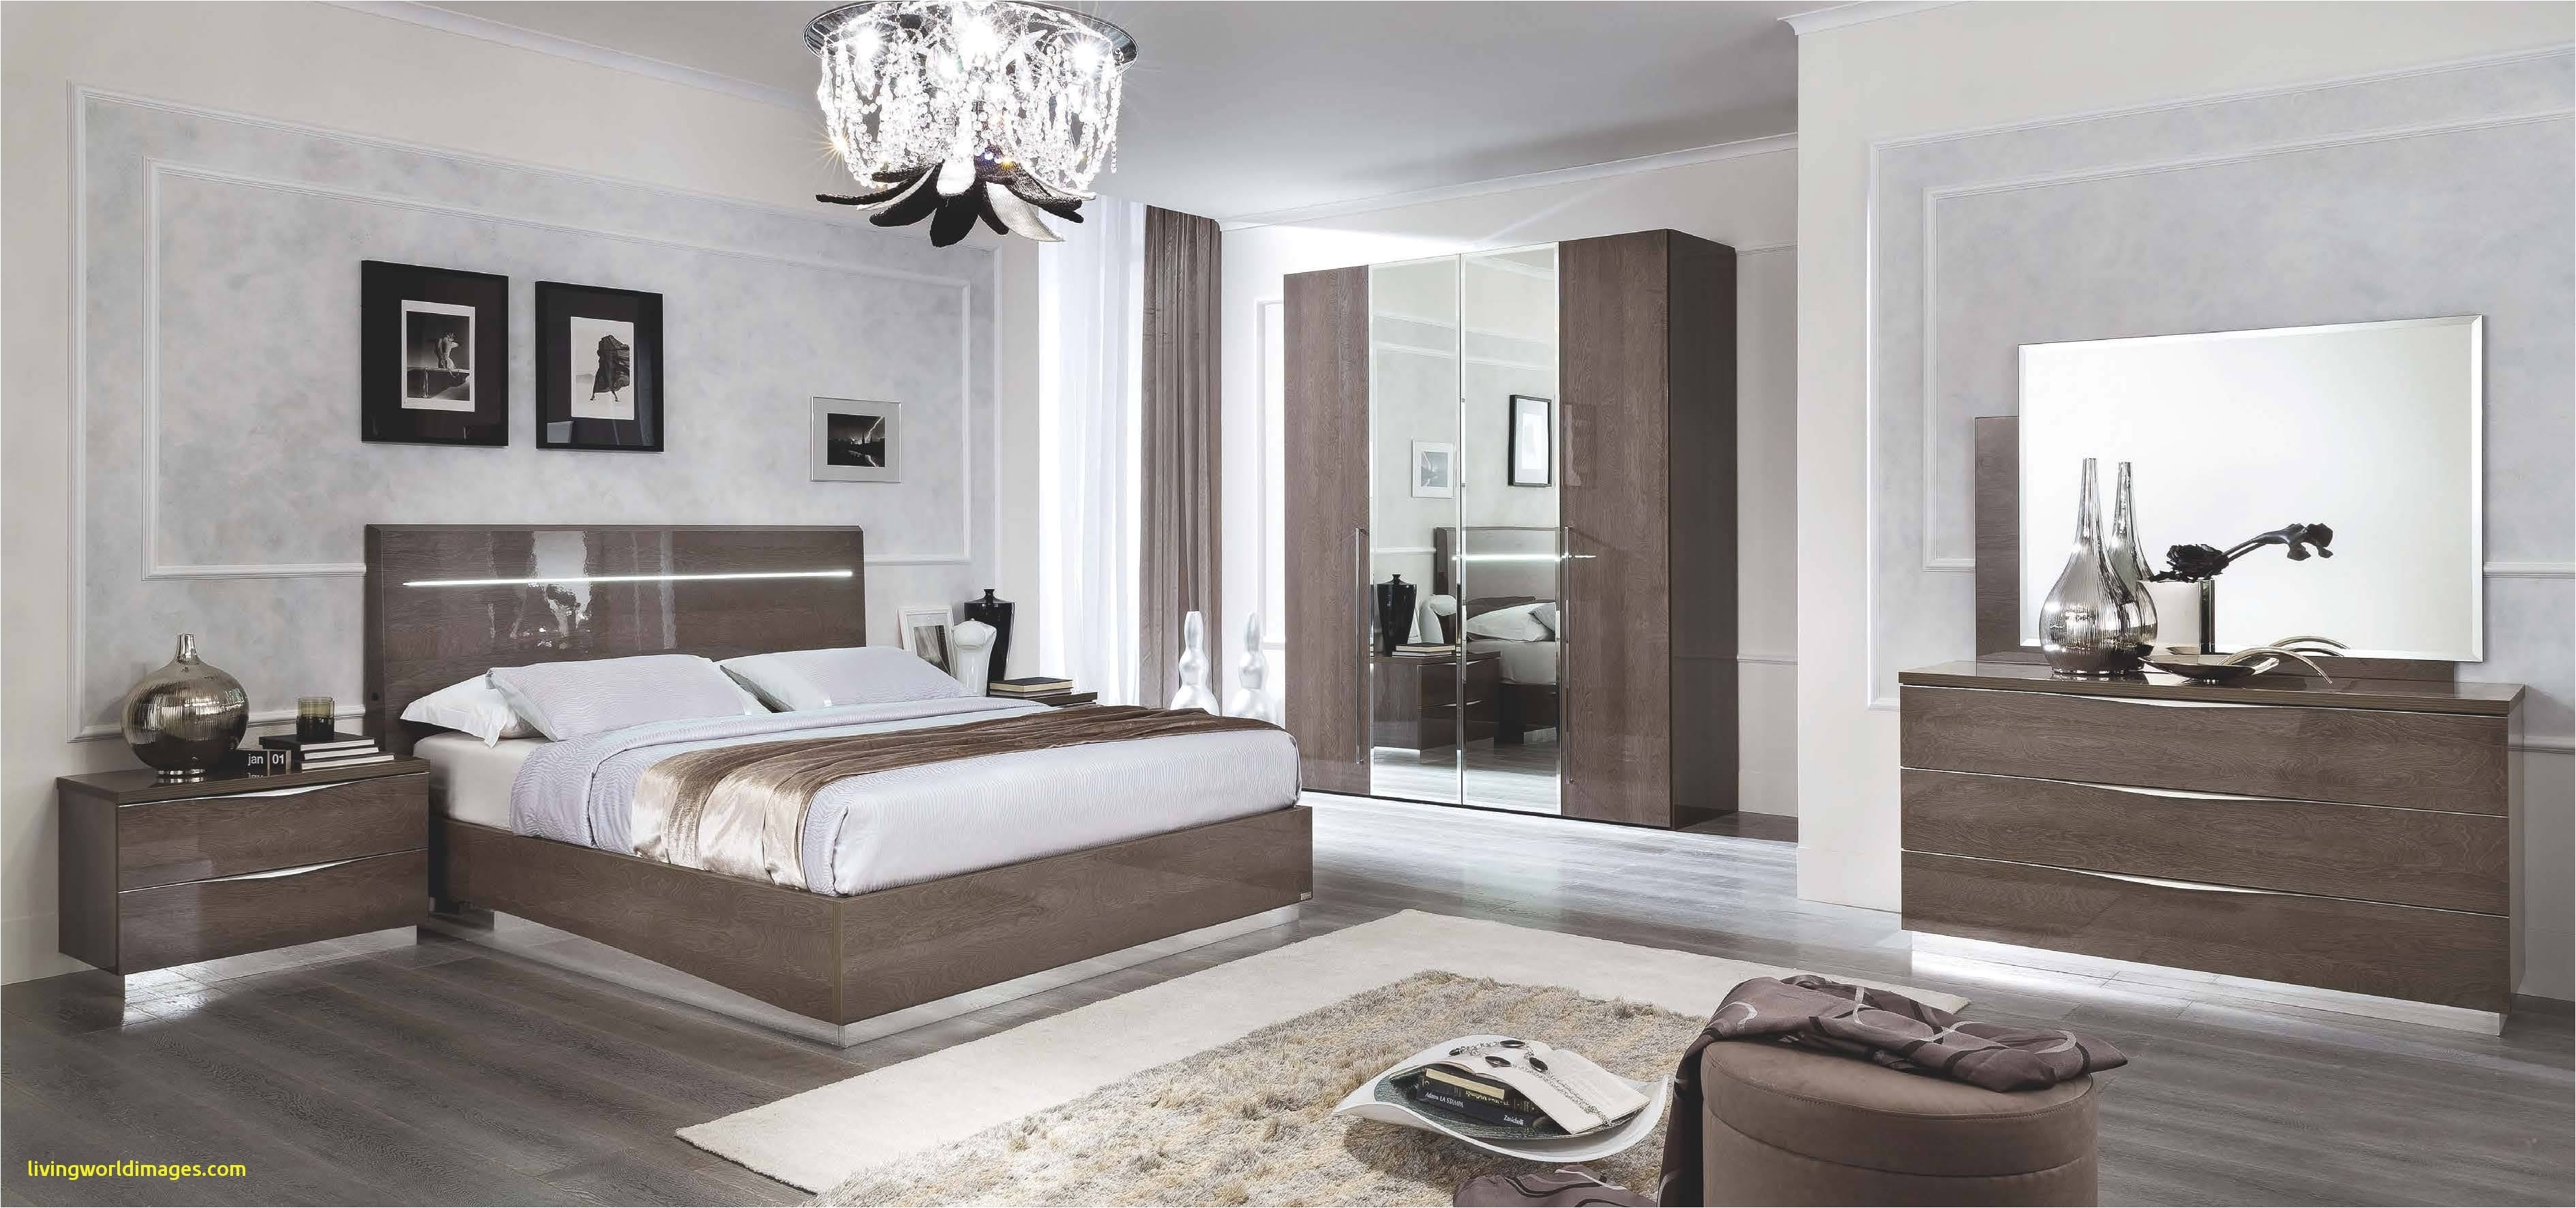 bedroom 36 bedroom modern furniture inspiring amazing contemporary living room tables virginia informer 30 bedroom